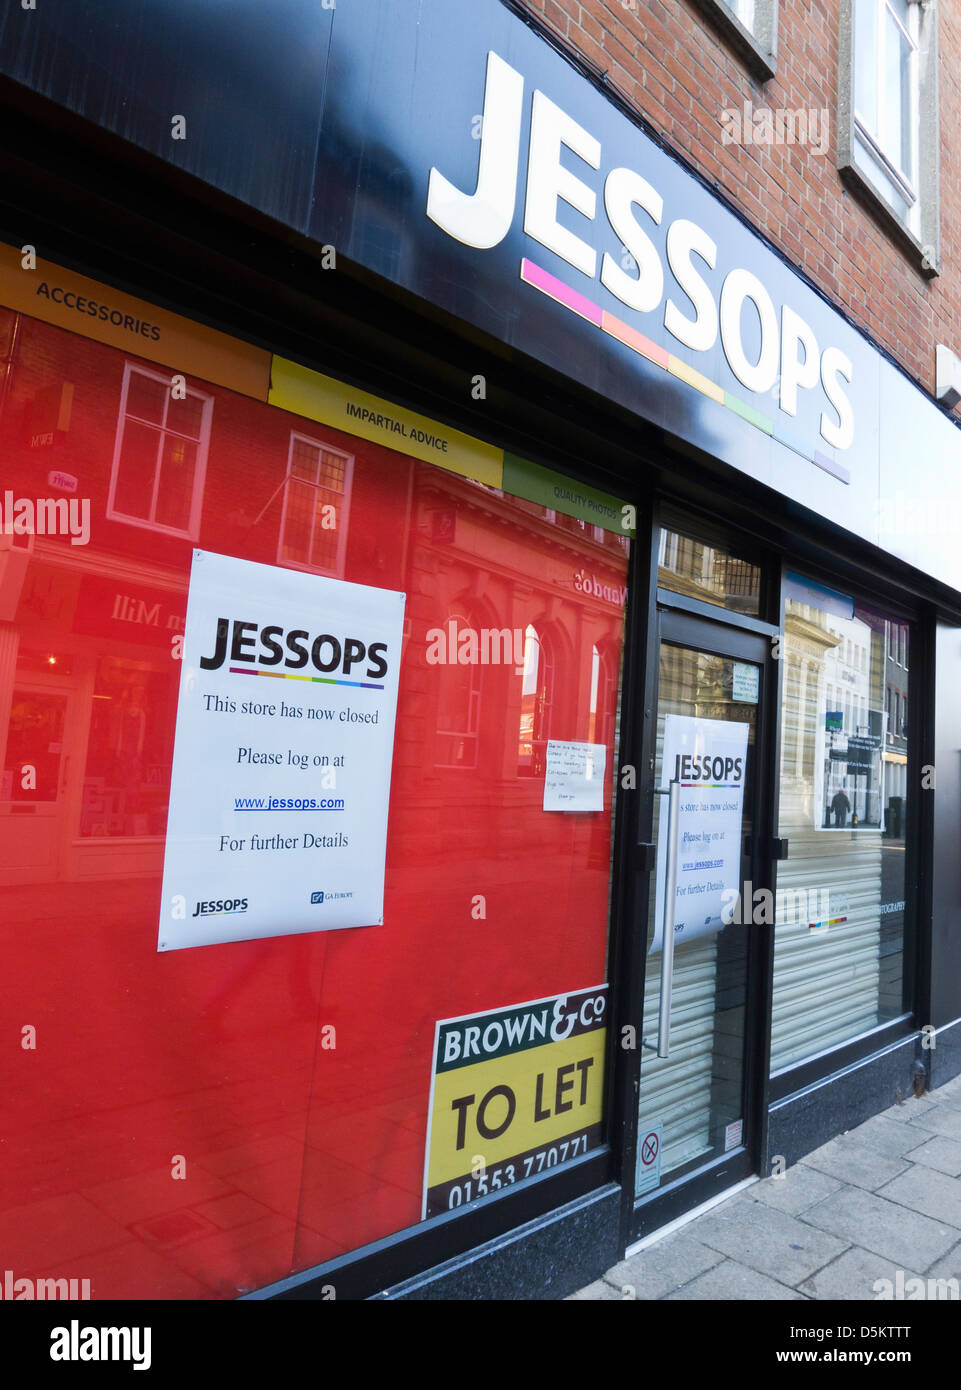 Closed Jessops shop in the high street in King's Lynn, Norfolk. - Stock Image